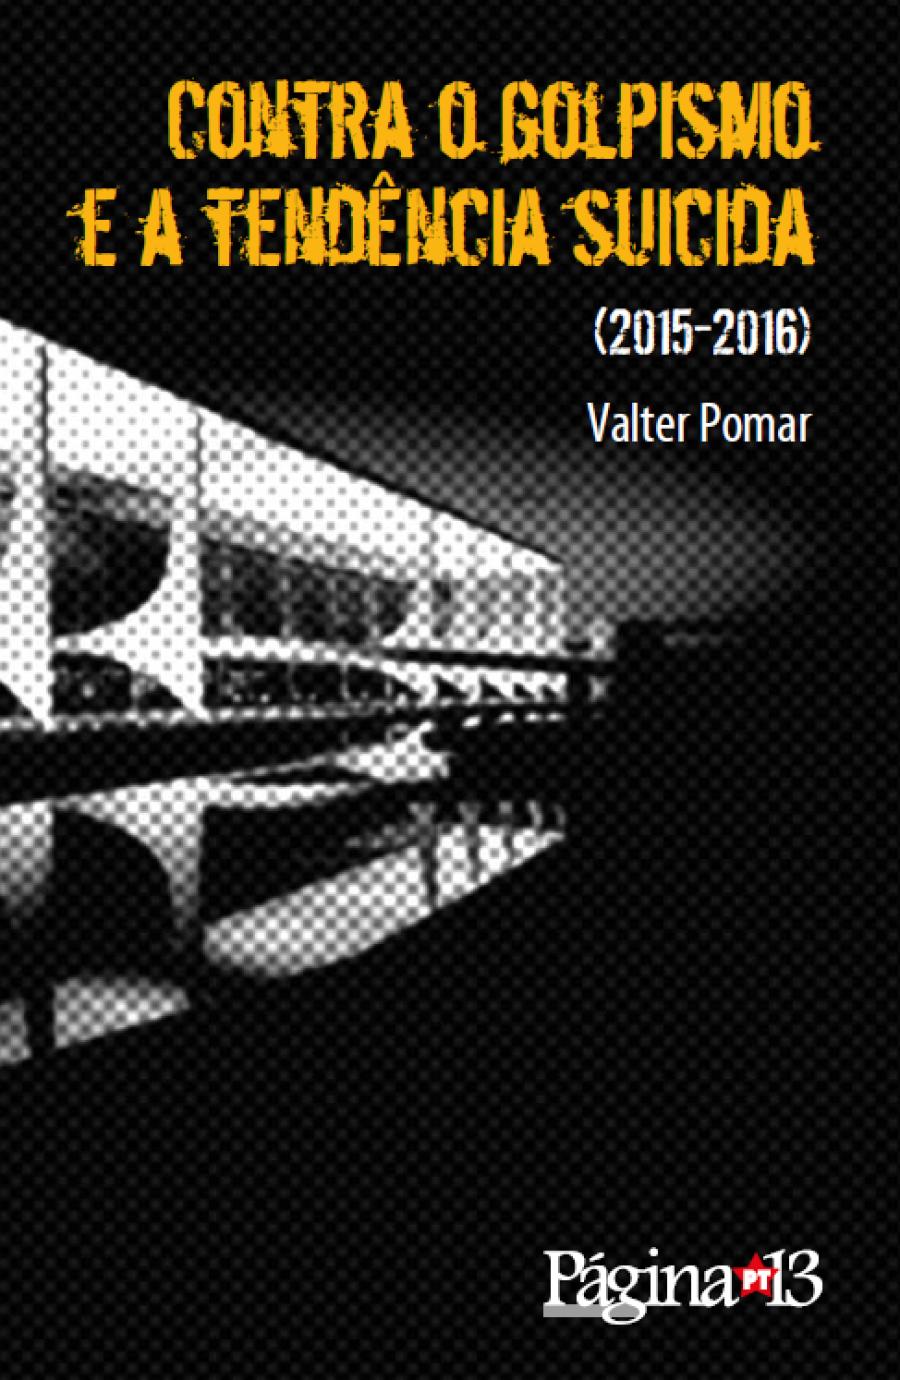 Contra o golpismo 2015-2016 por Valter Pomar